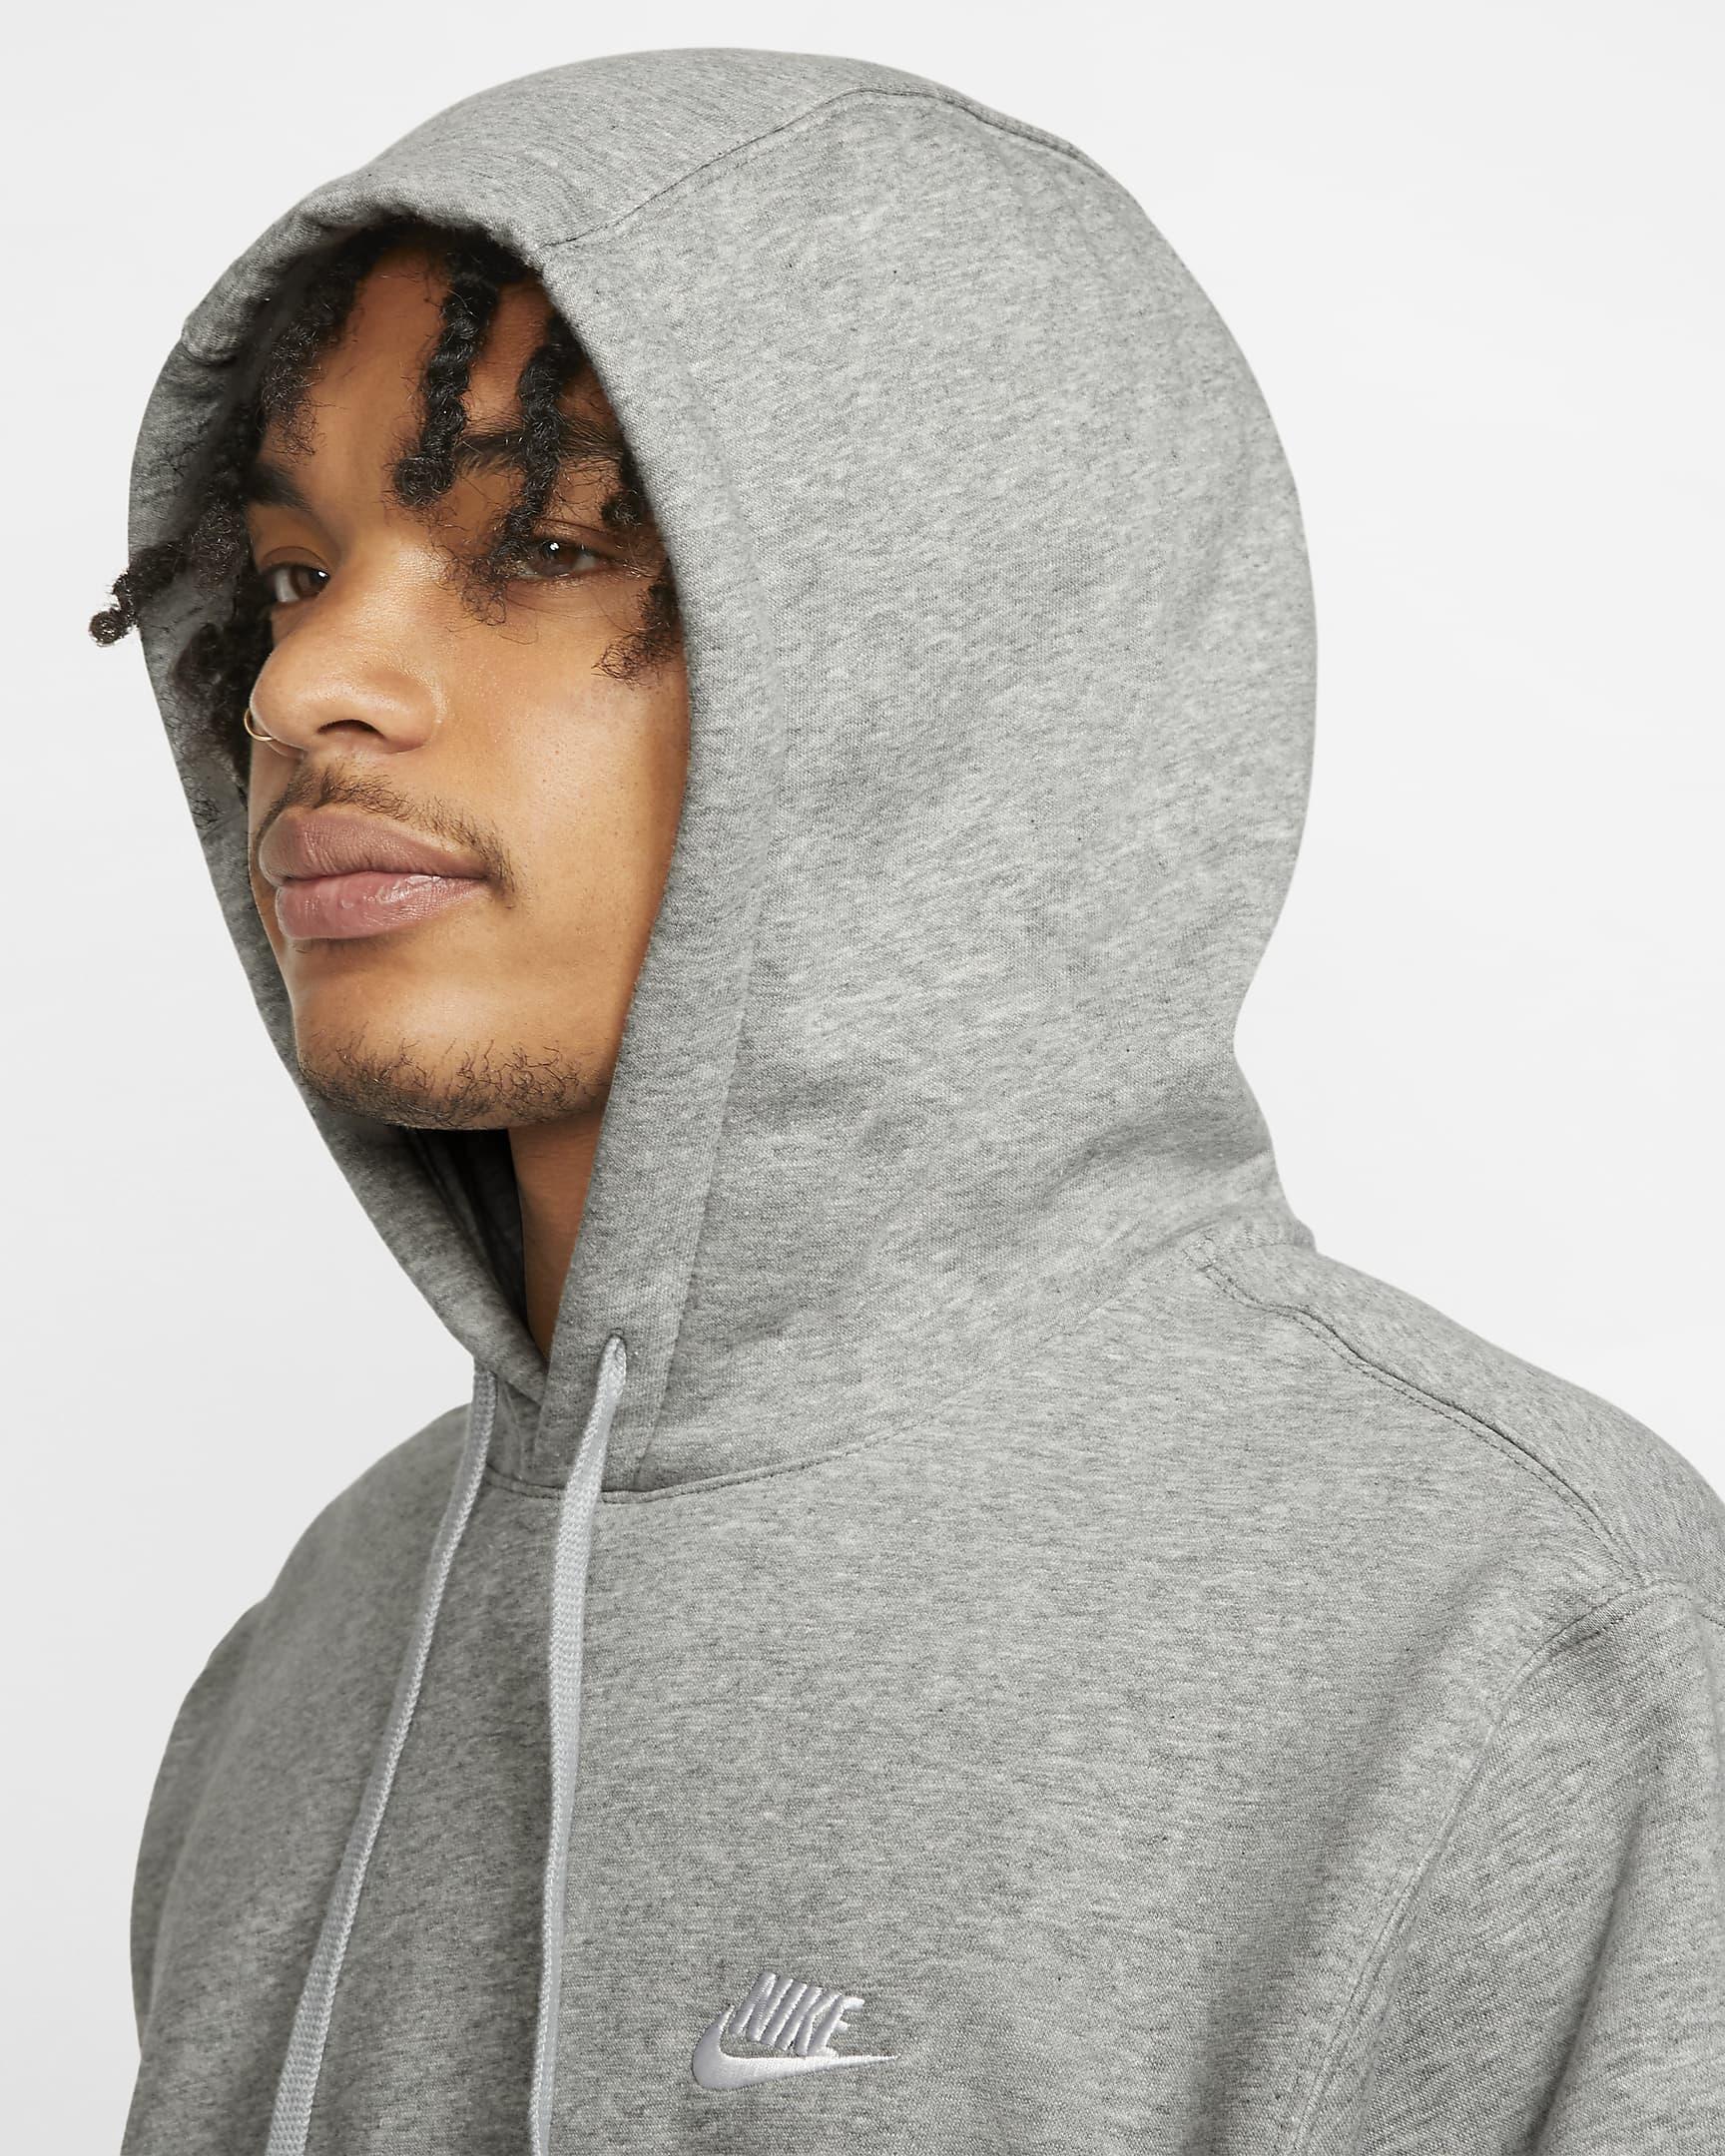 nike-sportswear-club-fleece-pullover-hoodie-Gw4Nwq-1.png